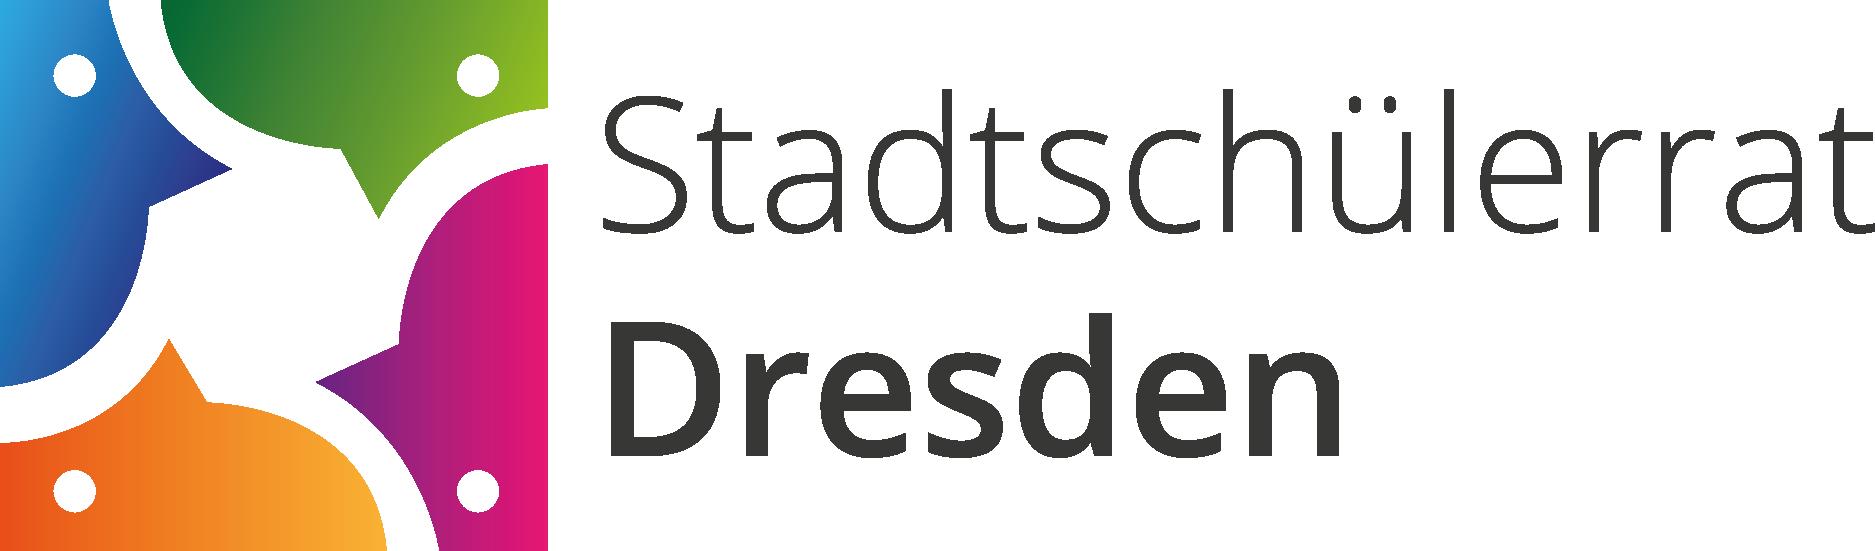 Stadtschülerrat Dresden